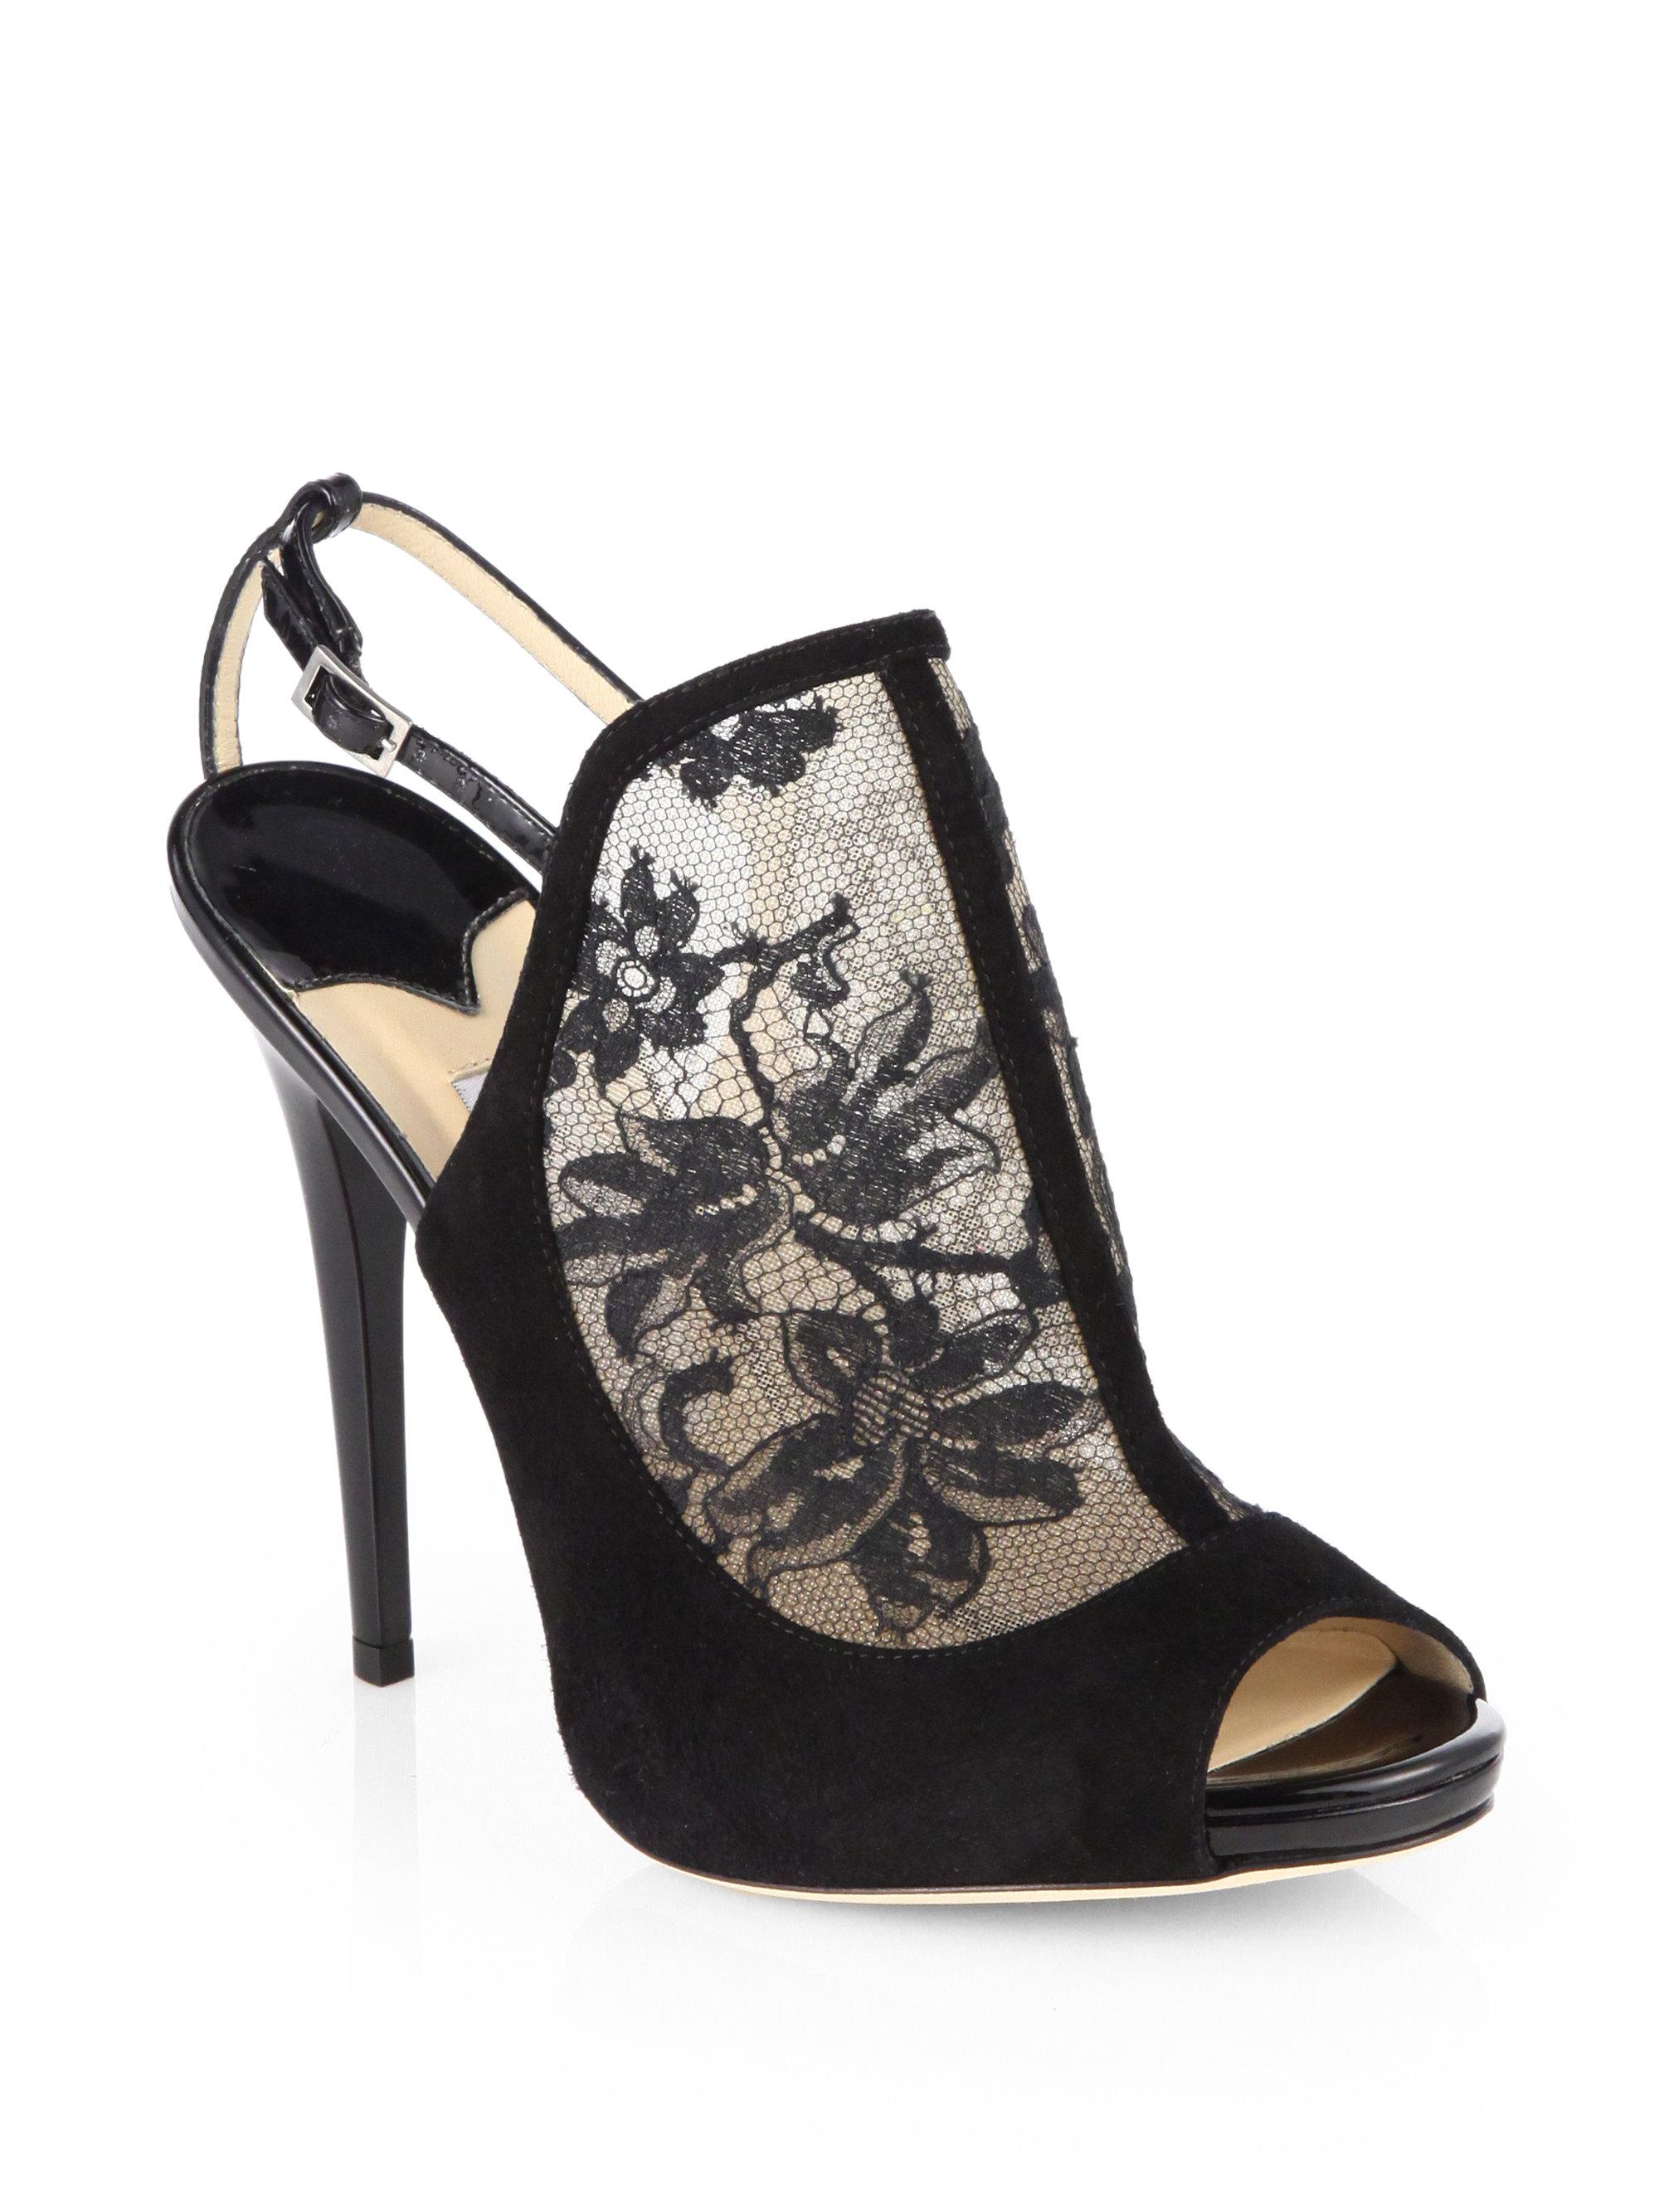 Jimmy Choo Maylen Lace Suede Sandals in Black | Lyst